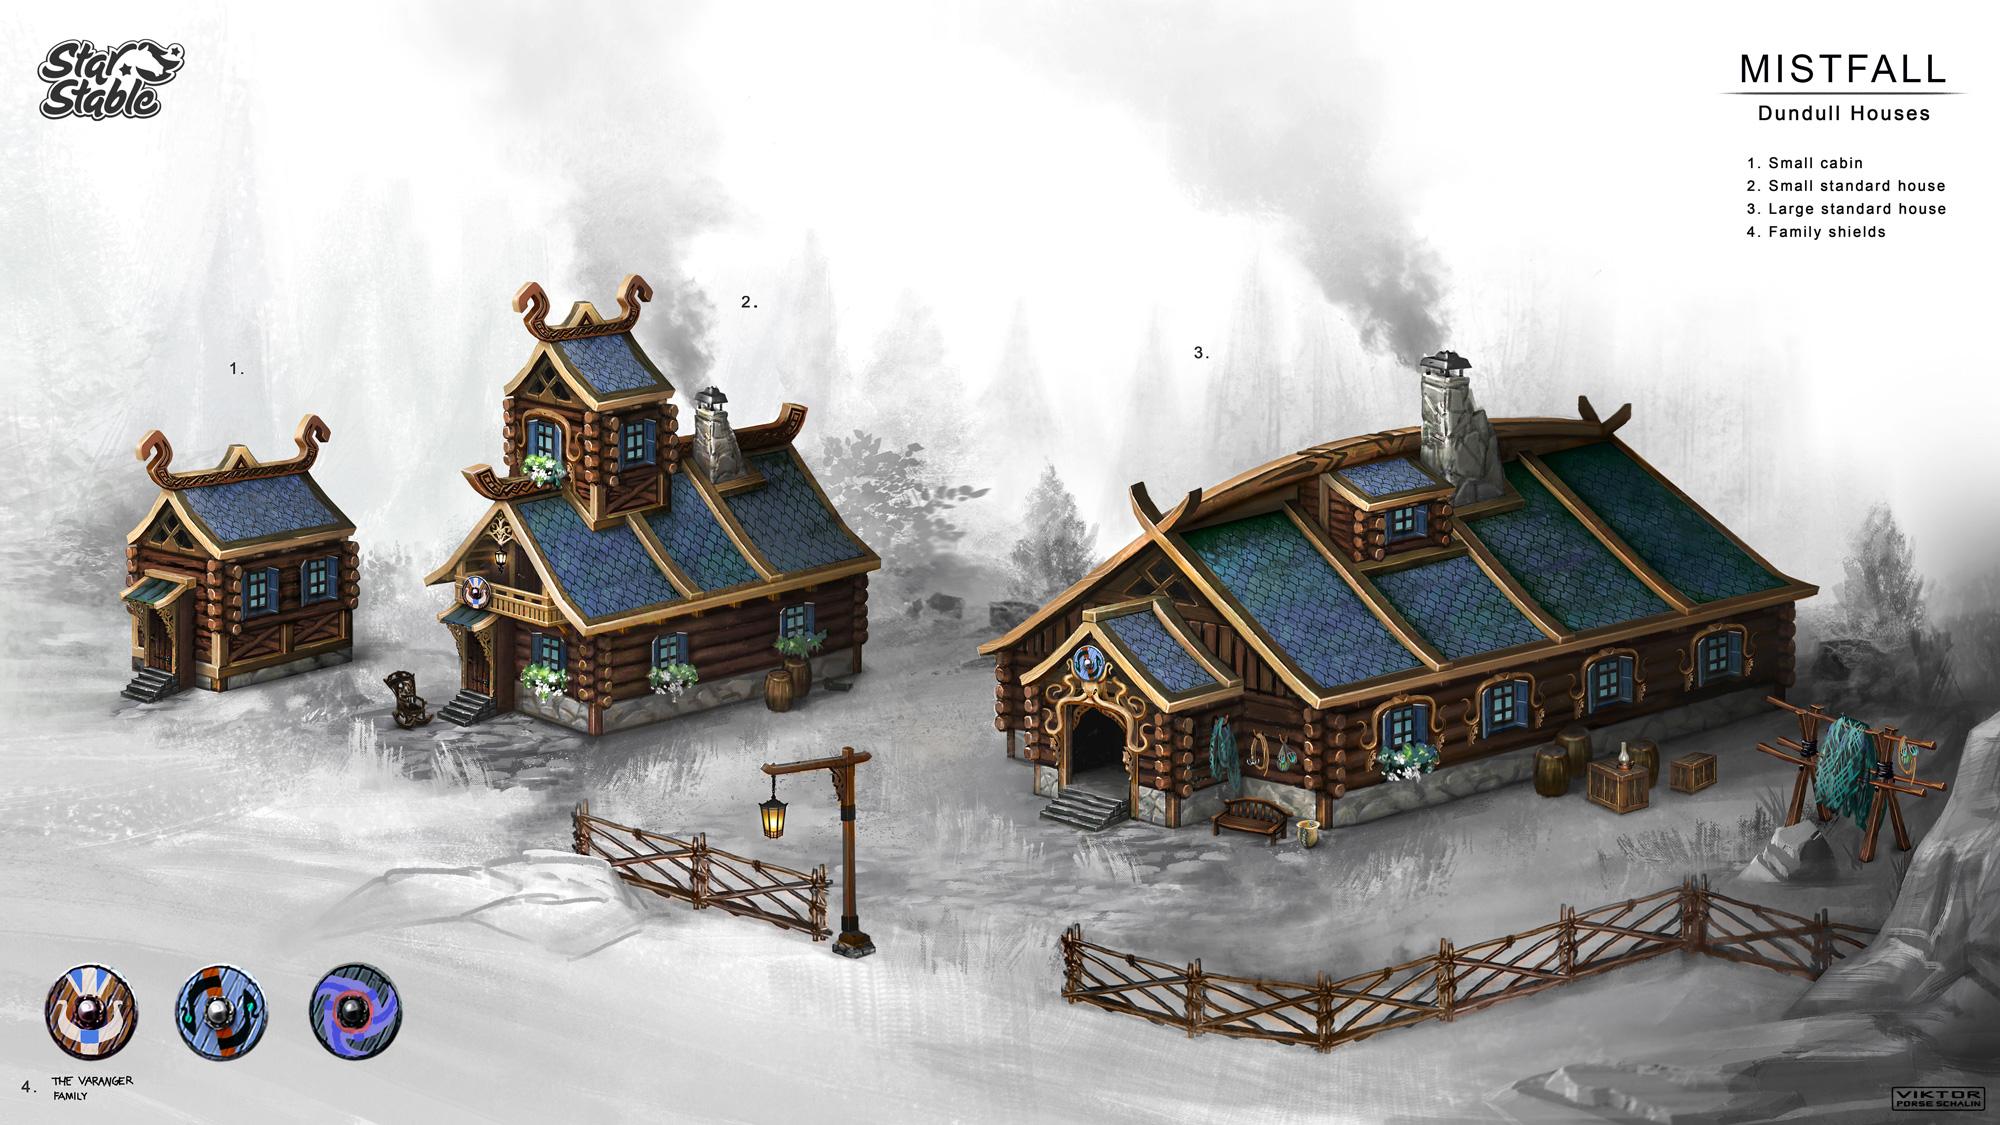 Mistfall Dundull Houses.jpg